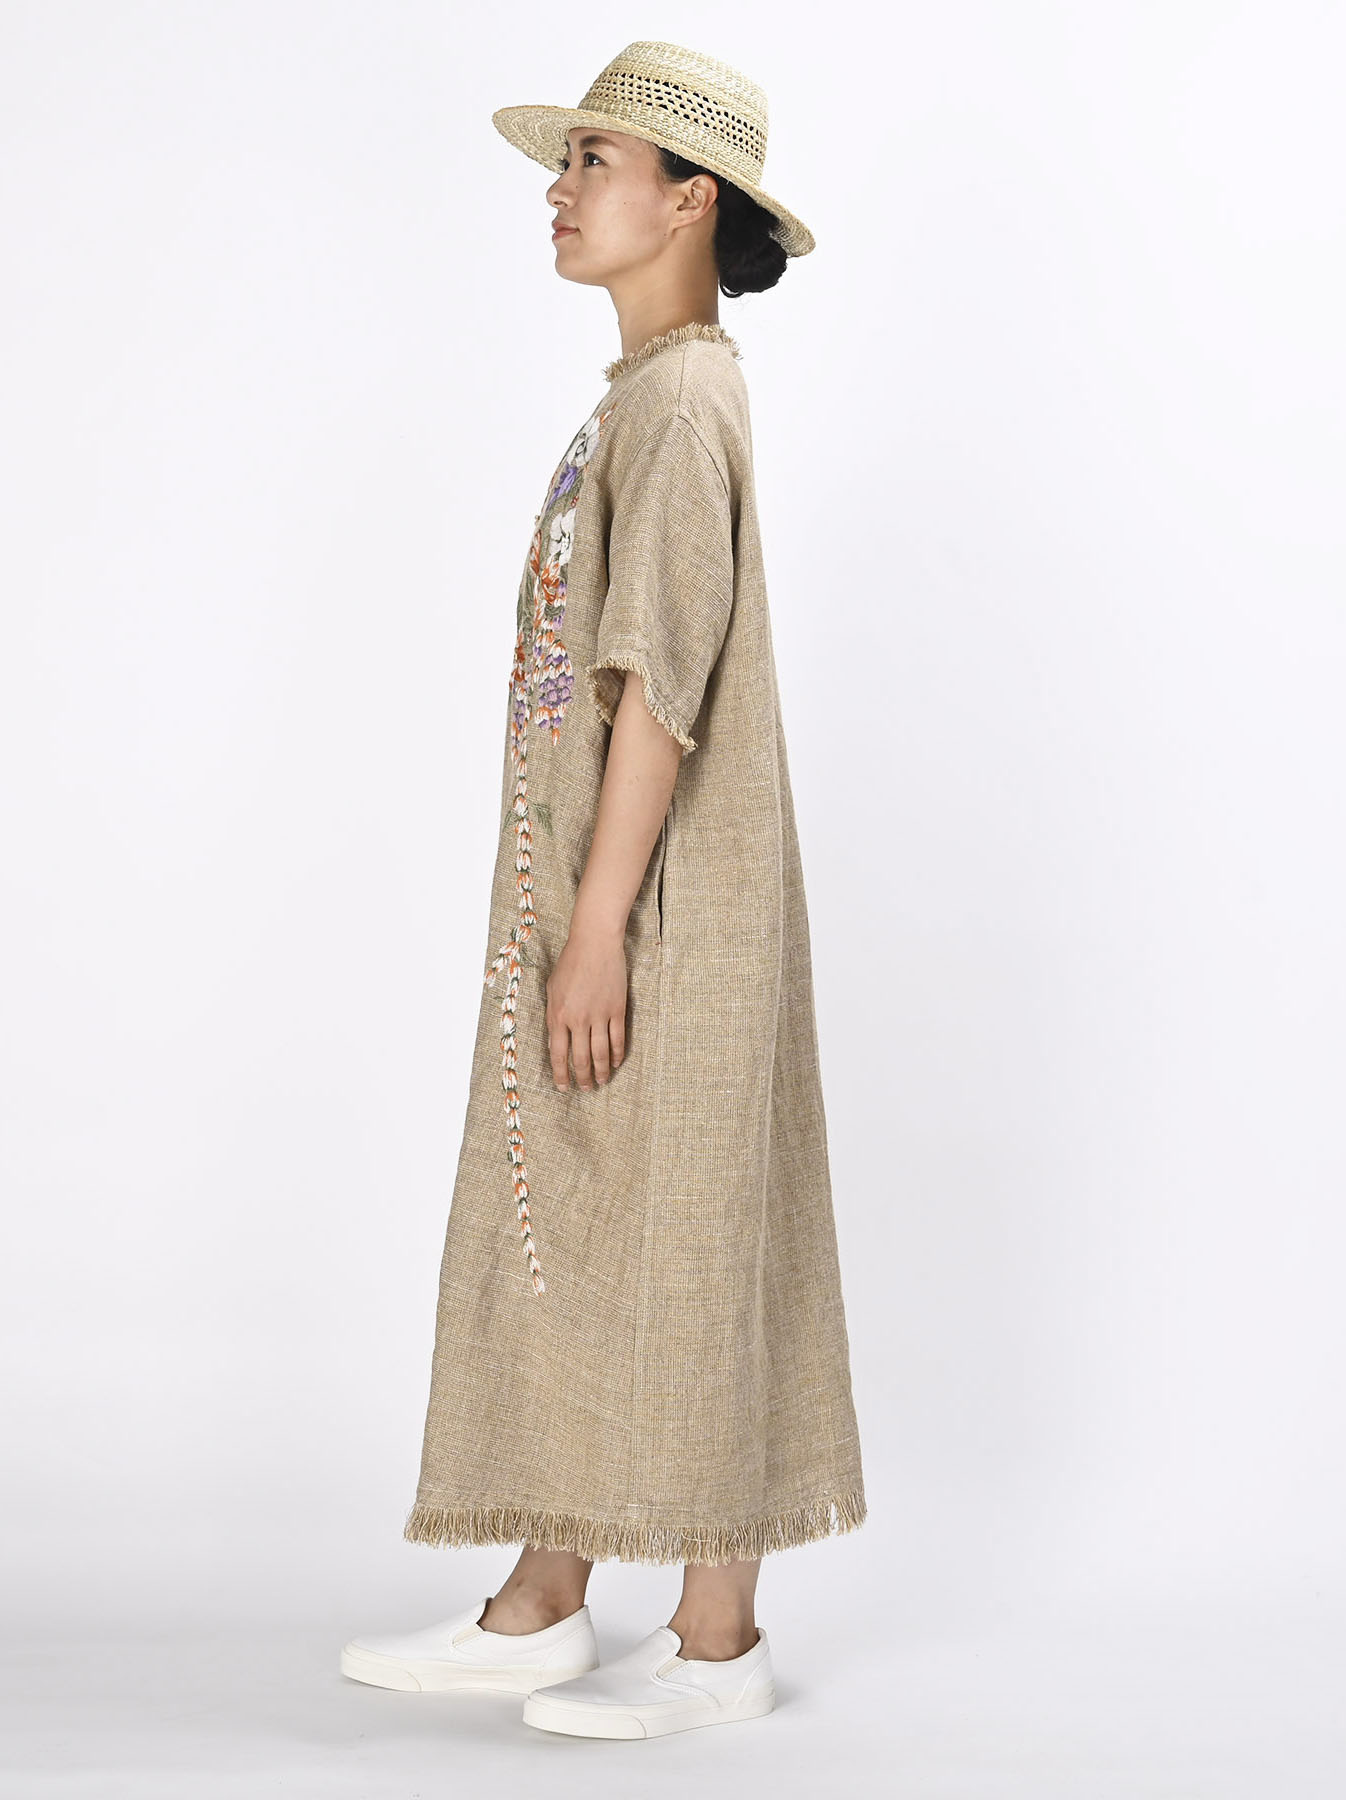 Gima Tweed Leilei Embroidery Dress-3